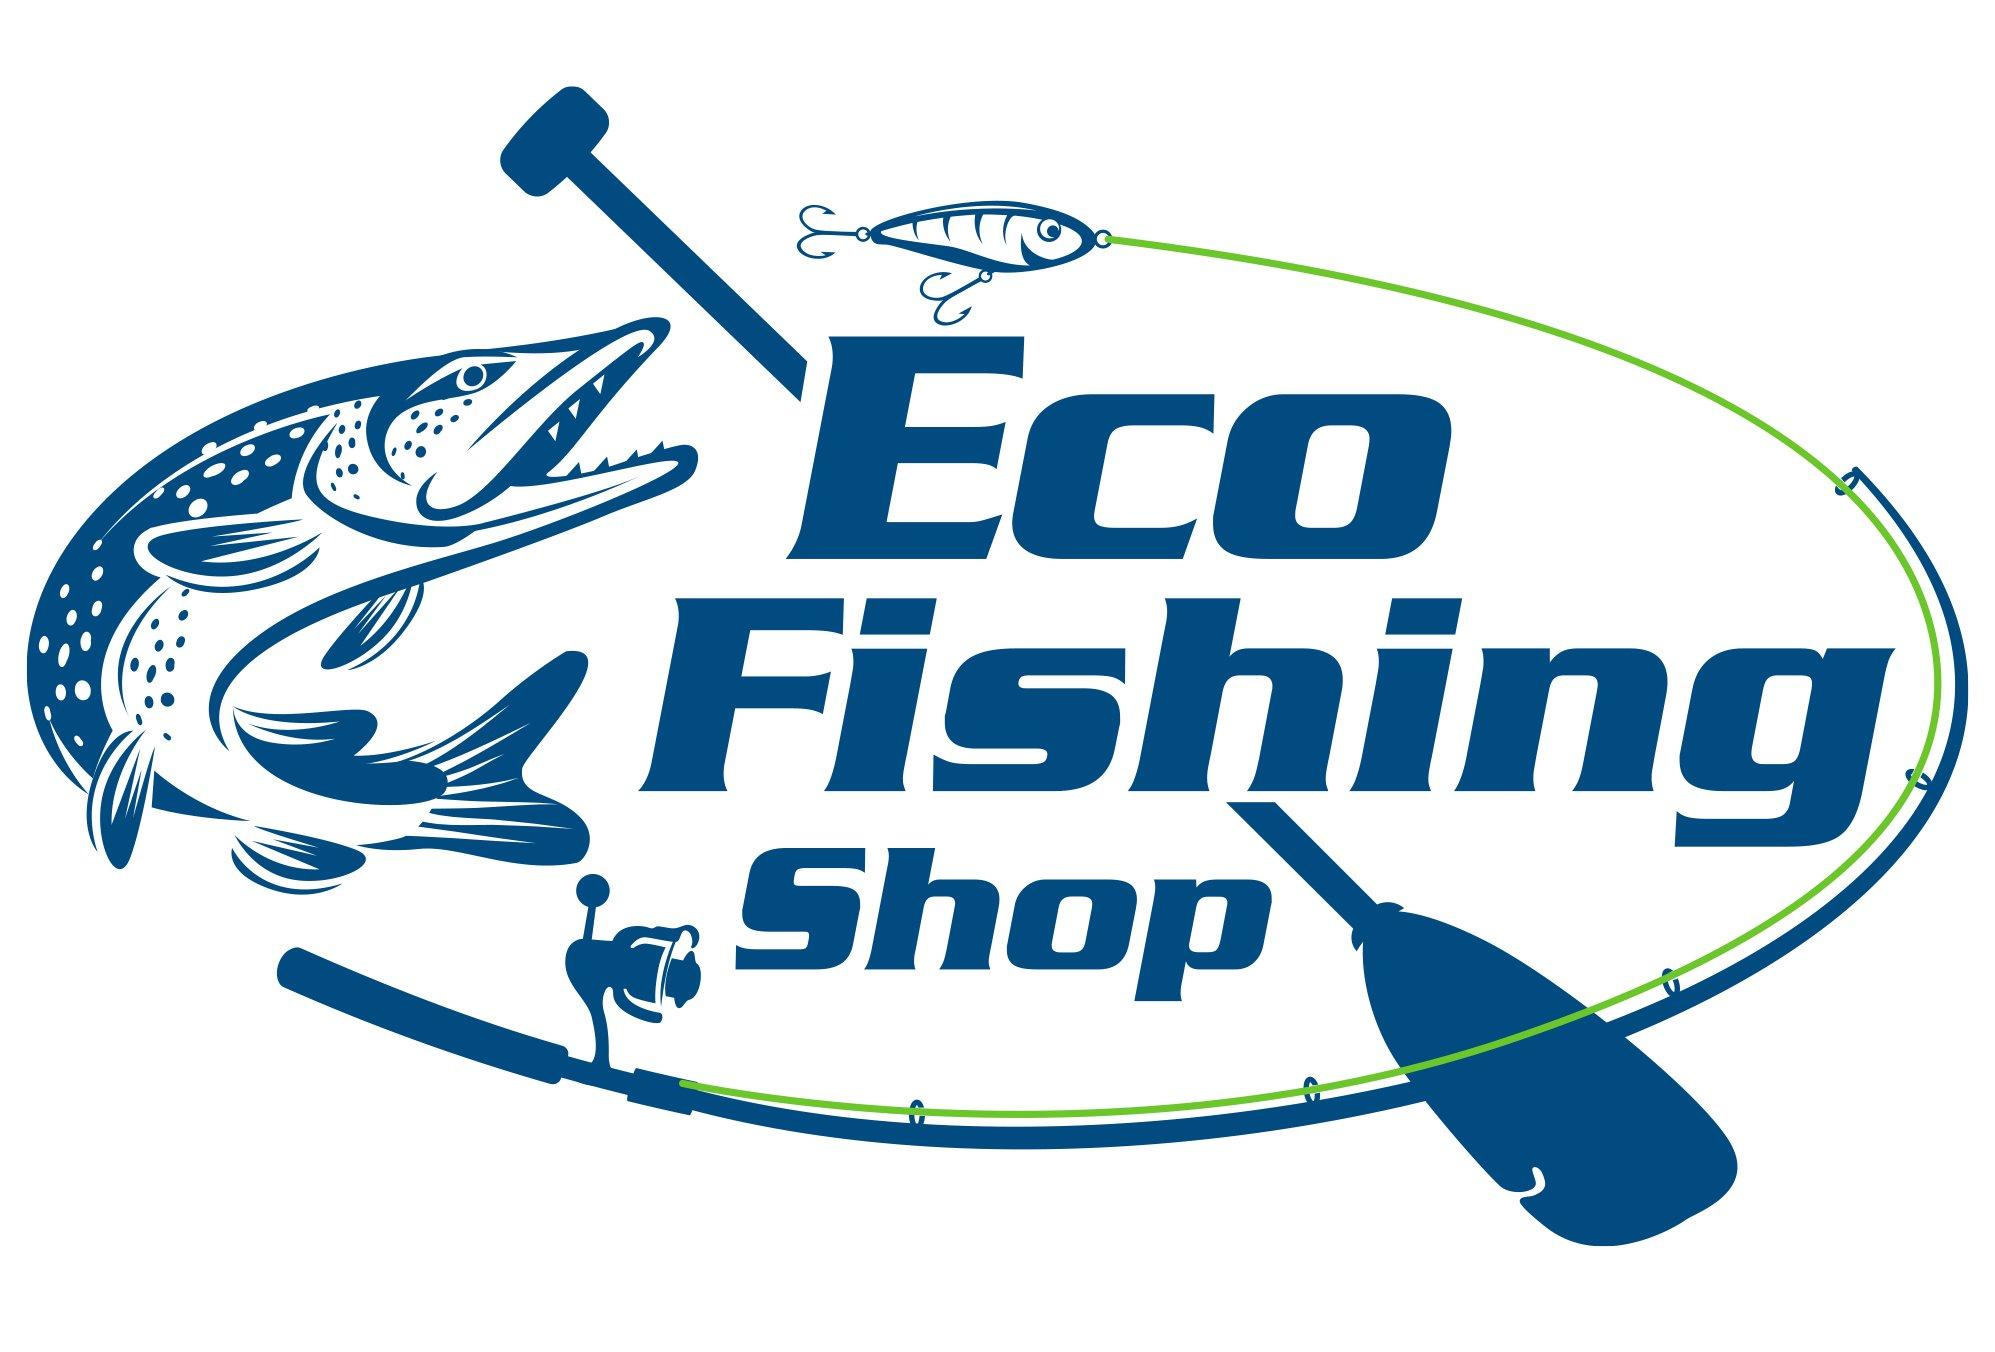 Growing the Kayak Fishing industry